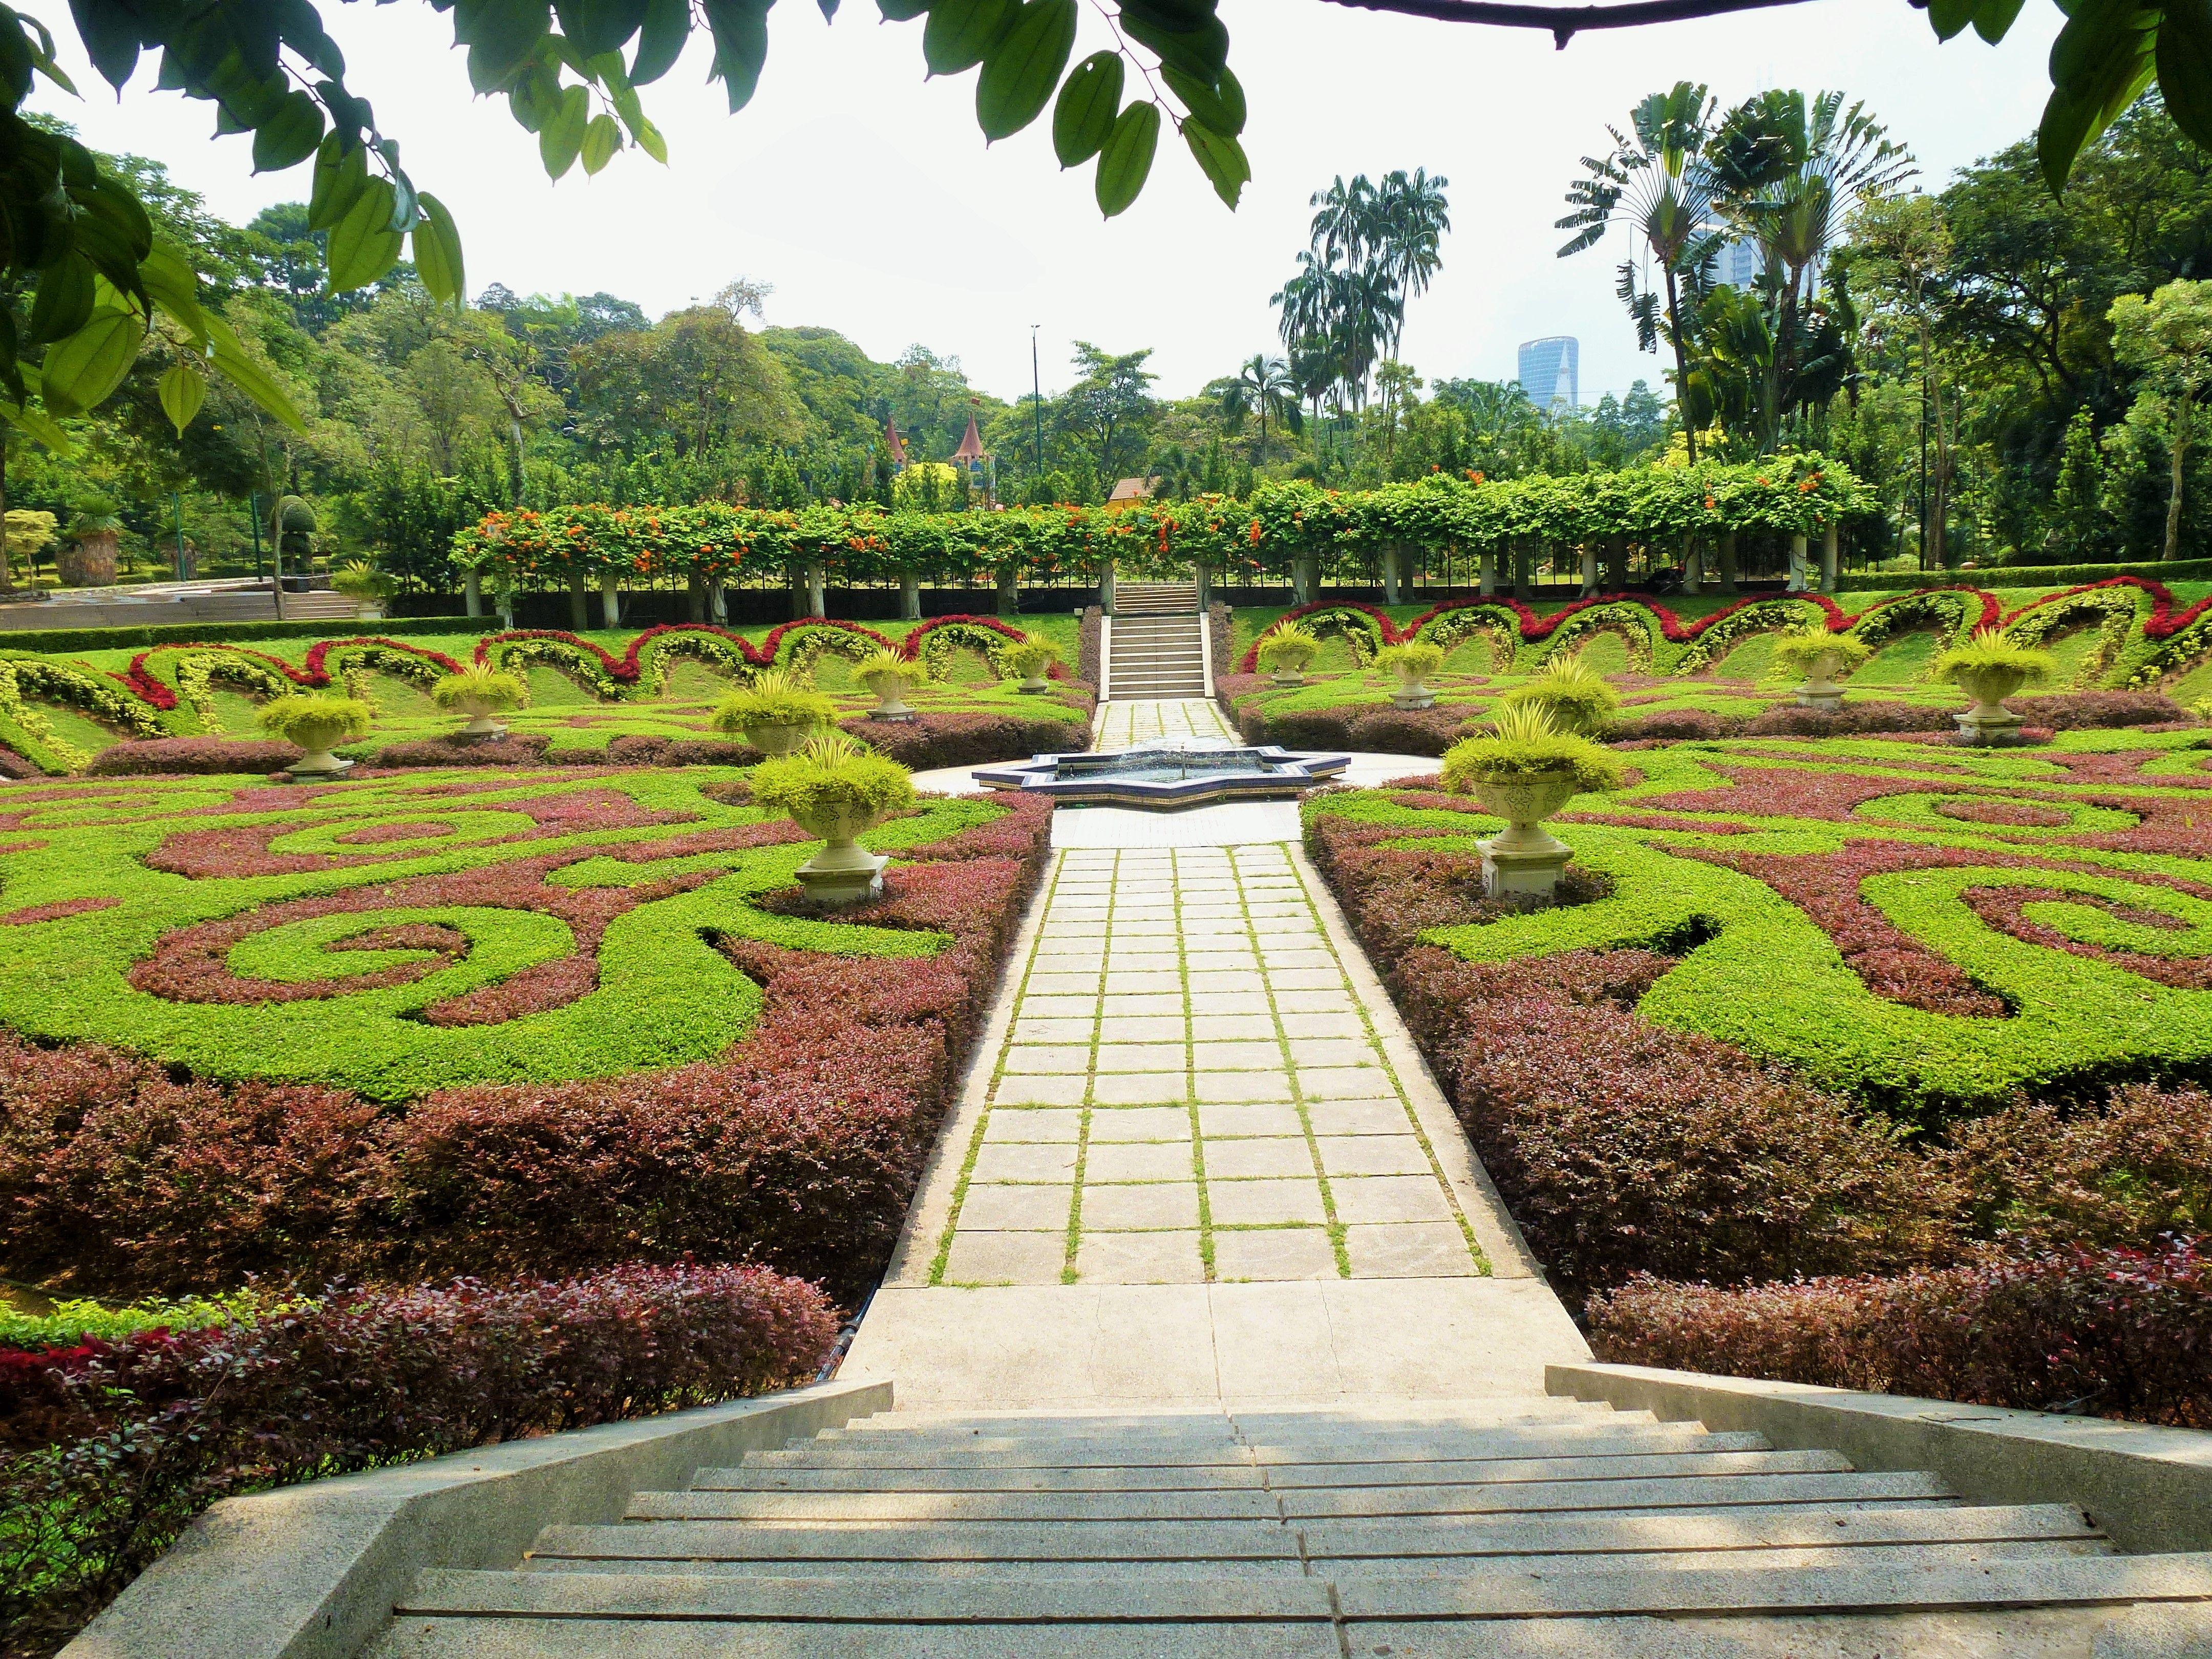 The Sunken Garden Lake Gardens, Kuala Lumpur is a place